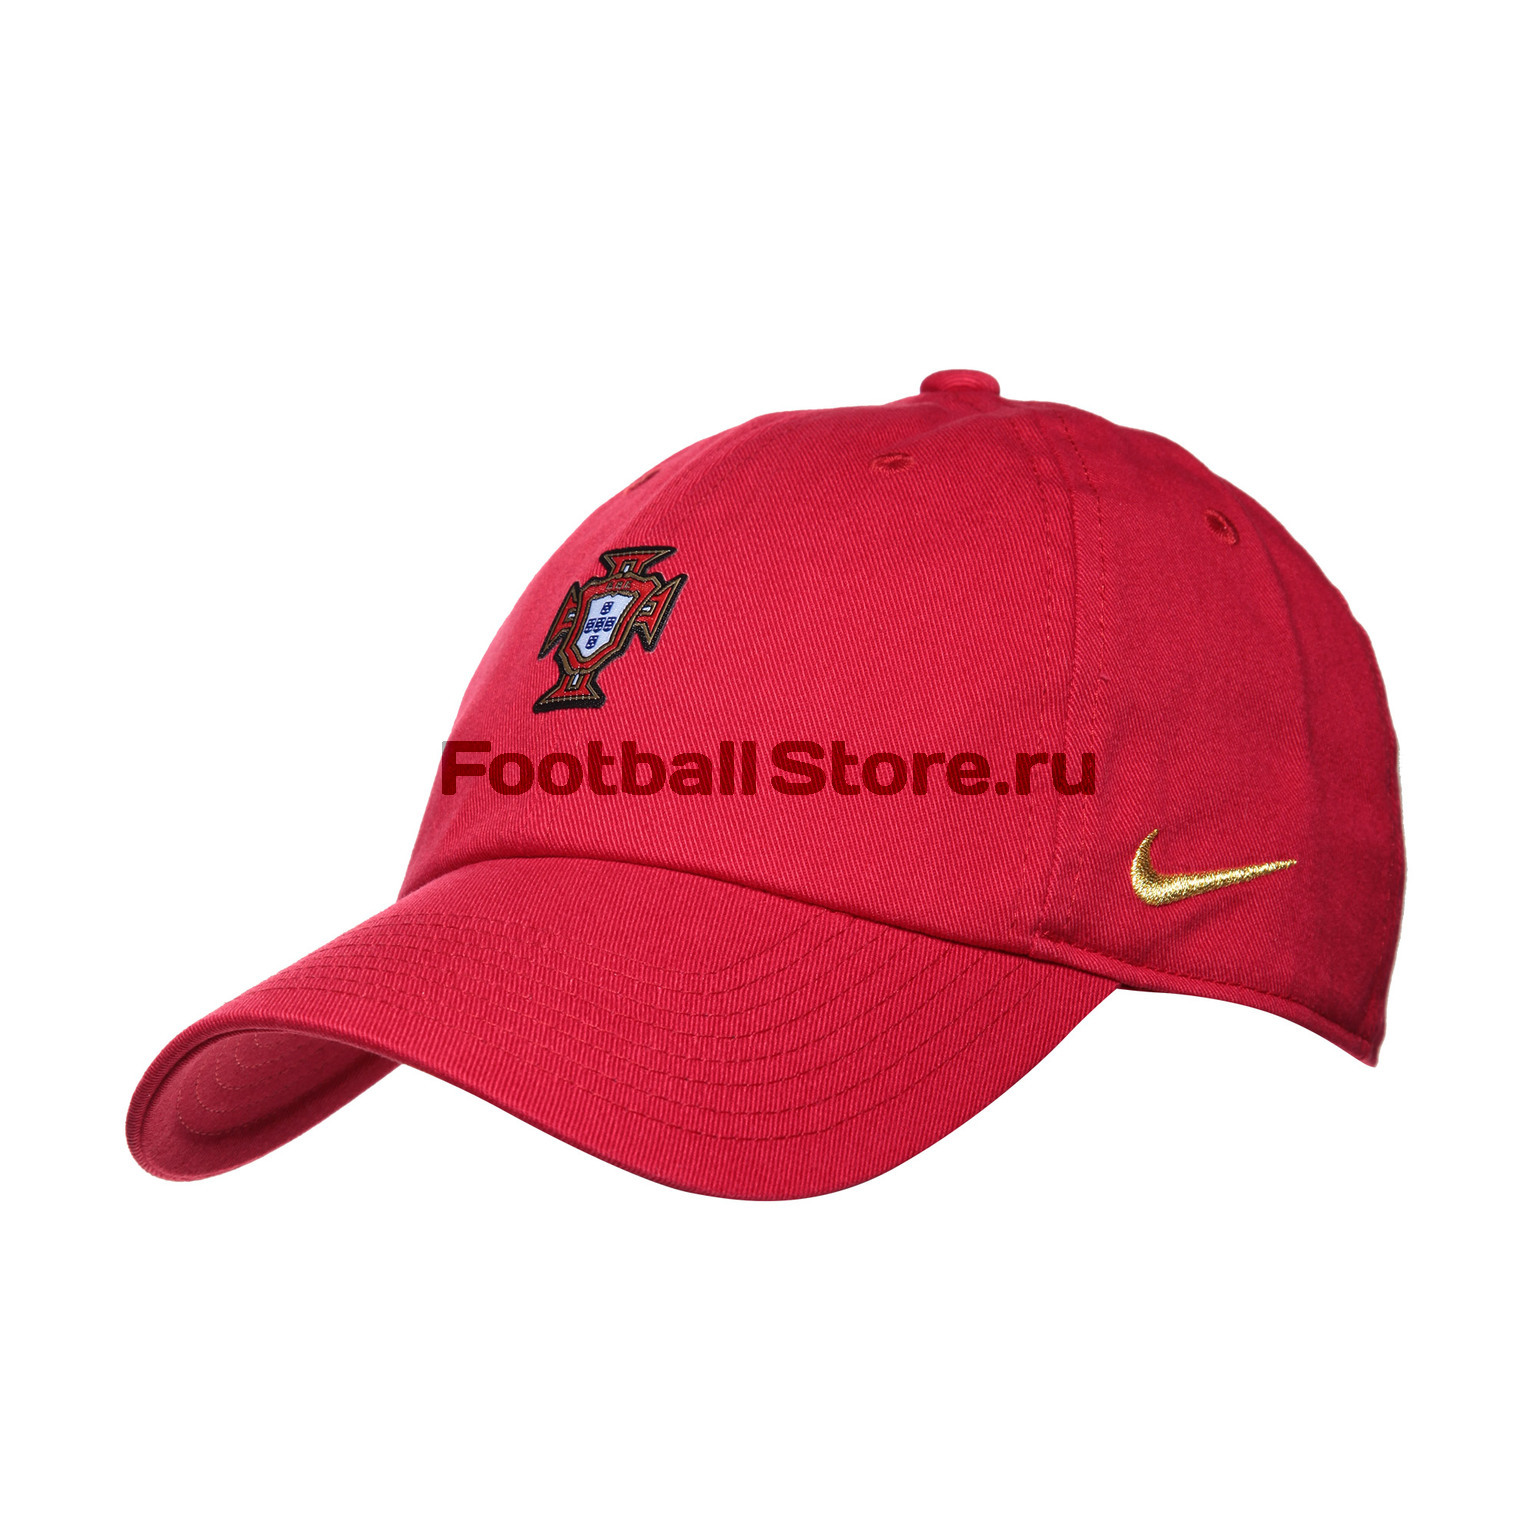 Бейсболка Nike сборной Португалии 898024-677 бейсболка nike run aw84 651659 413